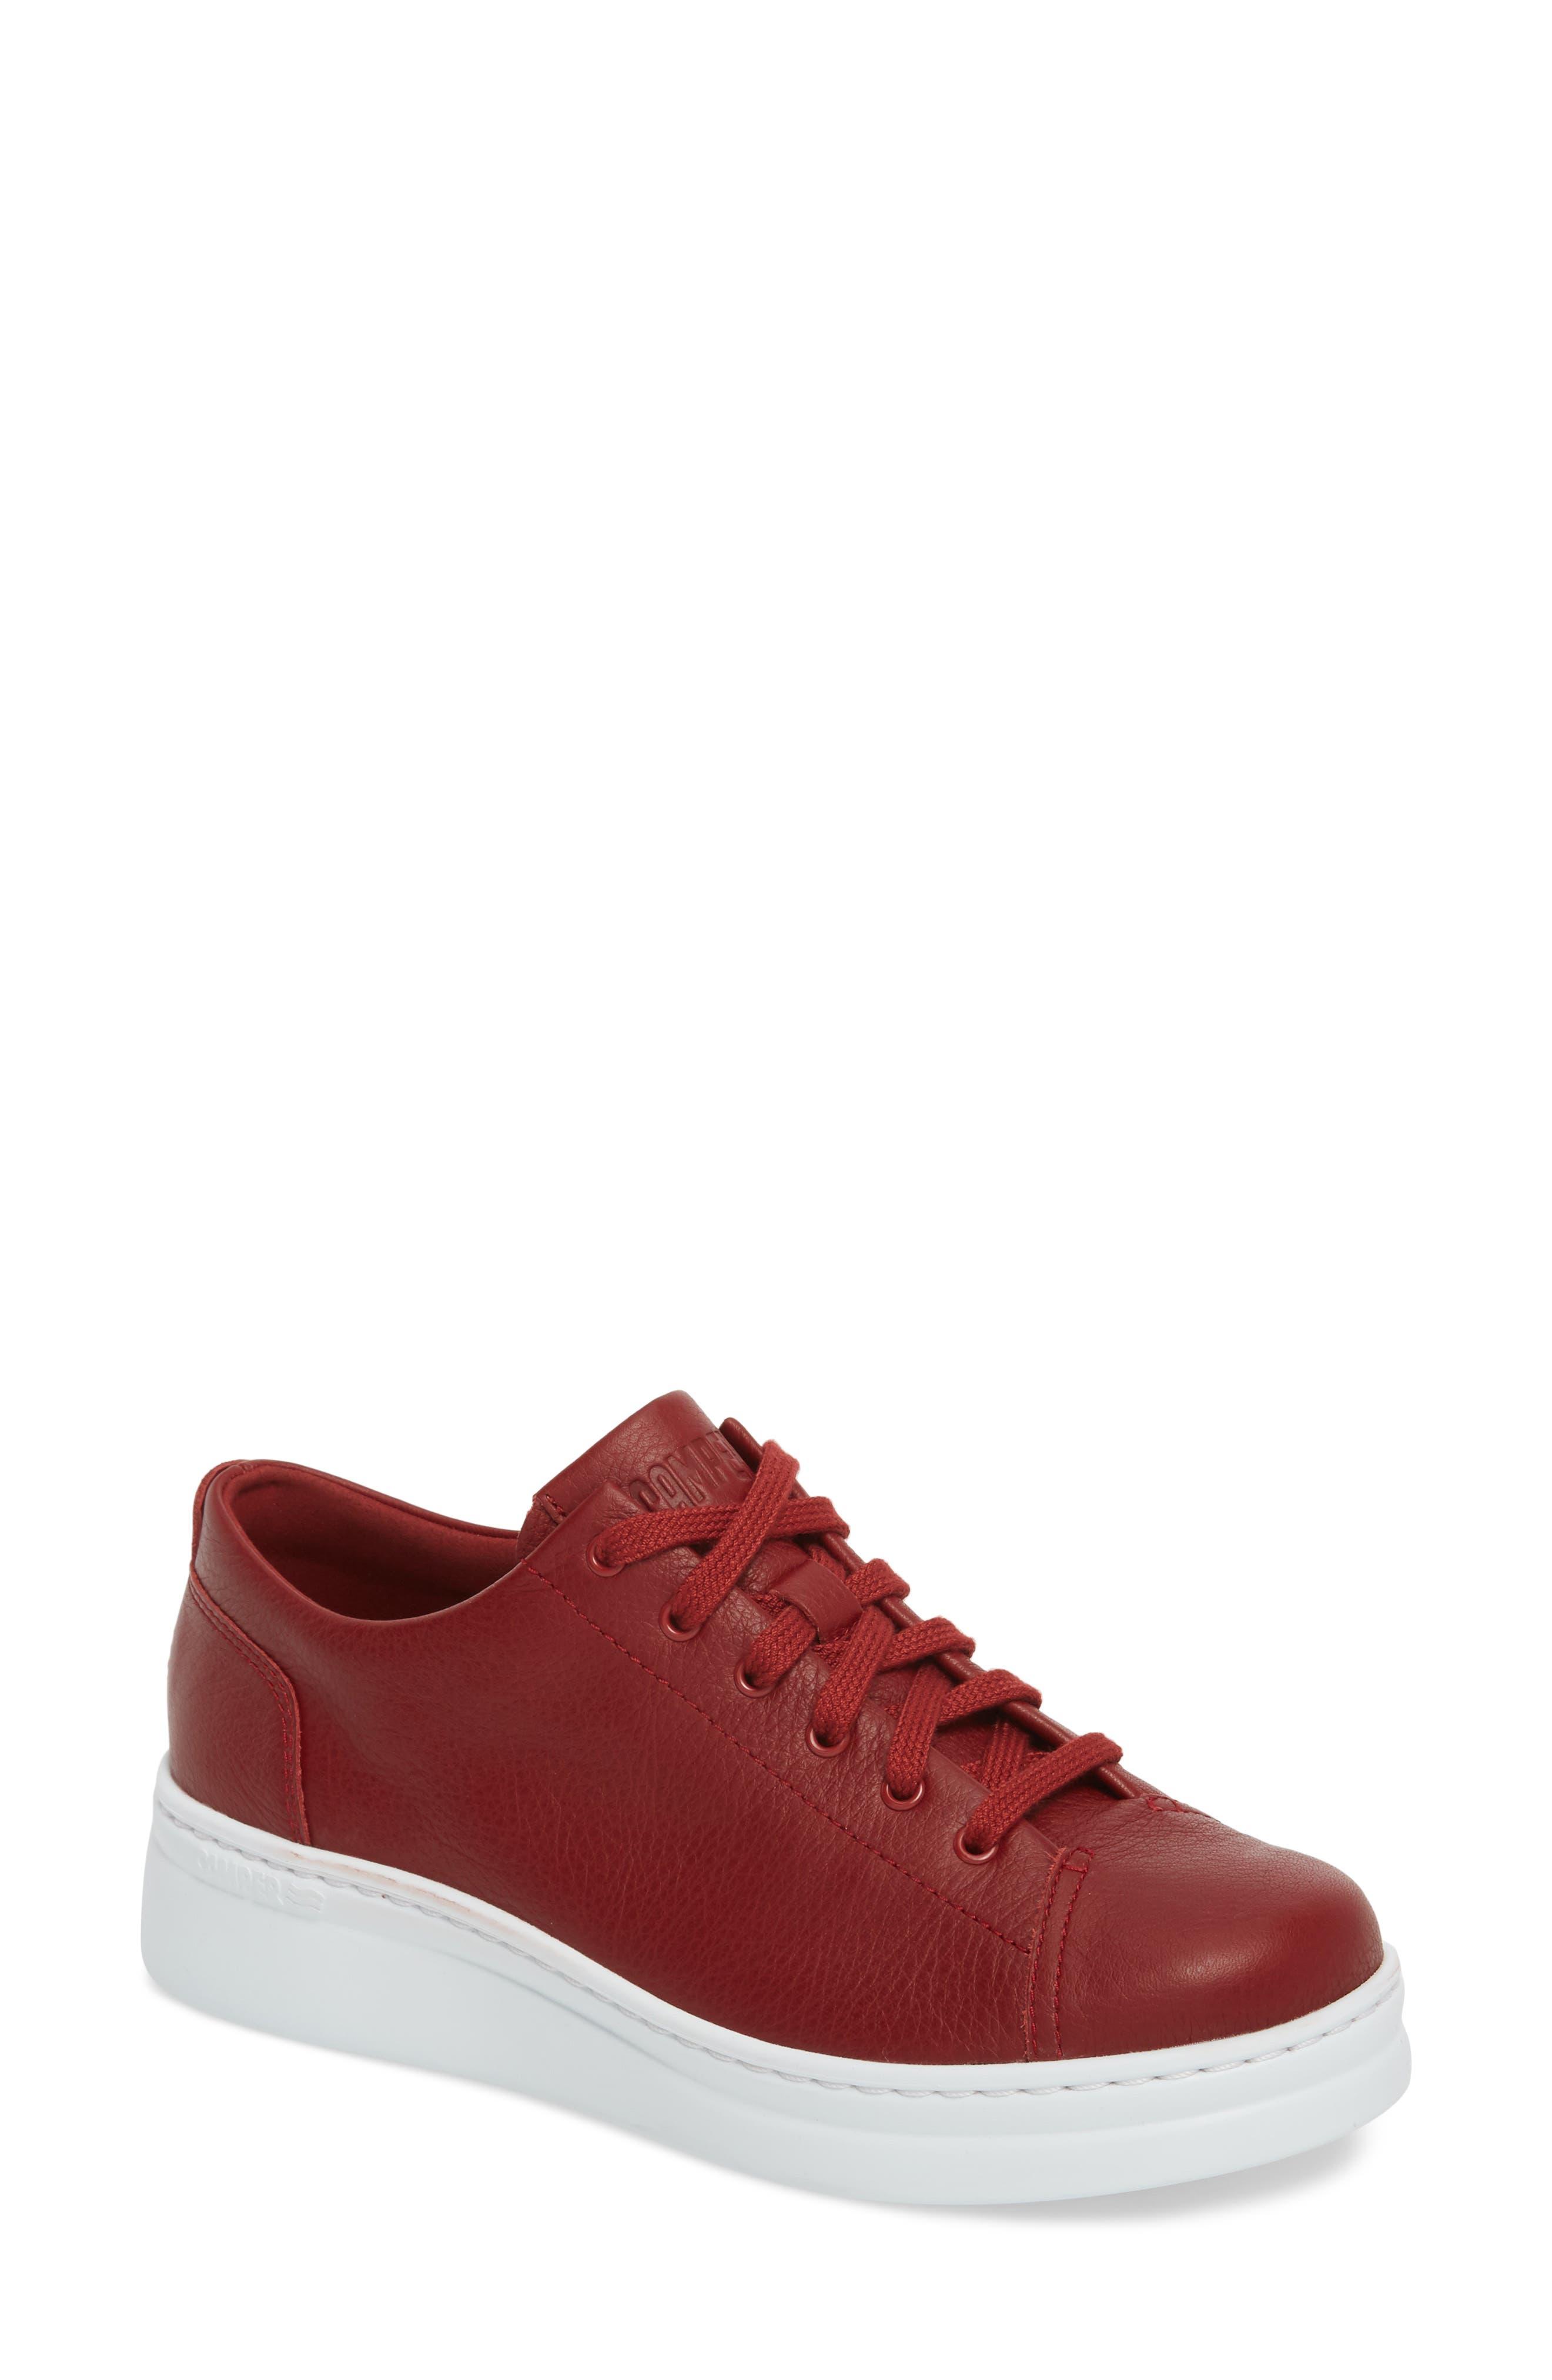 CAMPER Runner Up Sneaker, Main, color, DARK RED LEATHER